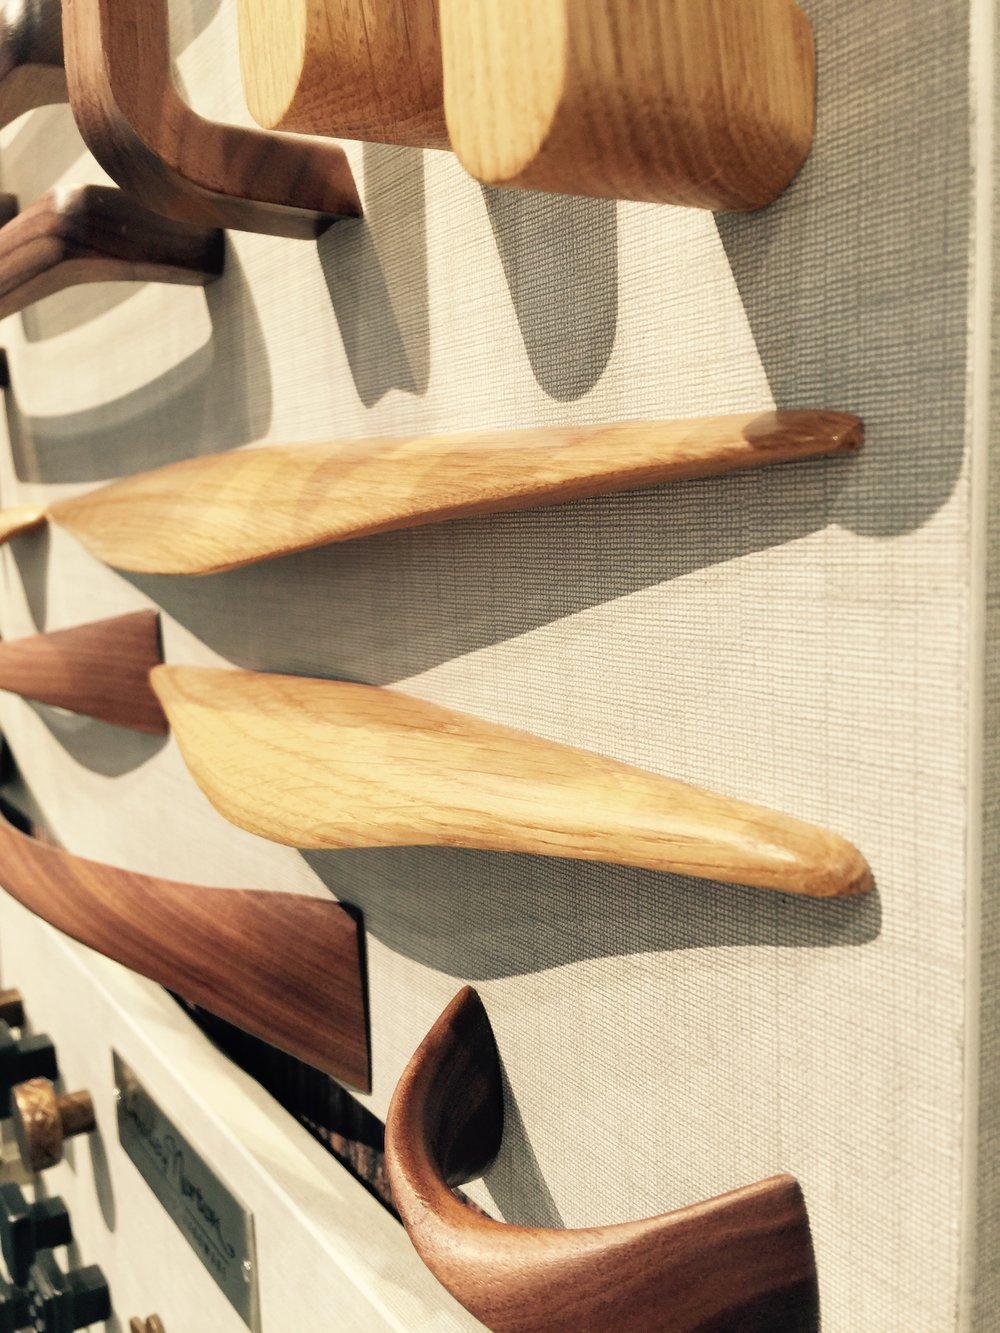 Manzoni wood cabinet pulls - KBIS 2016